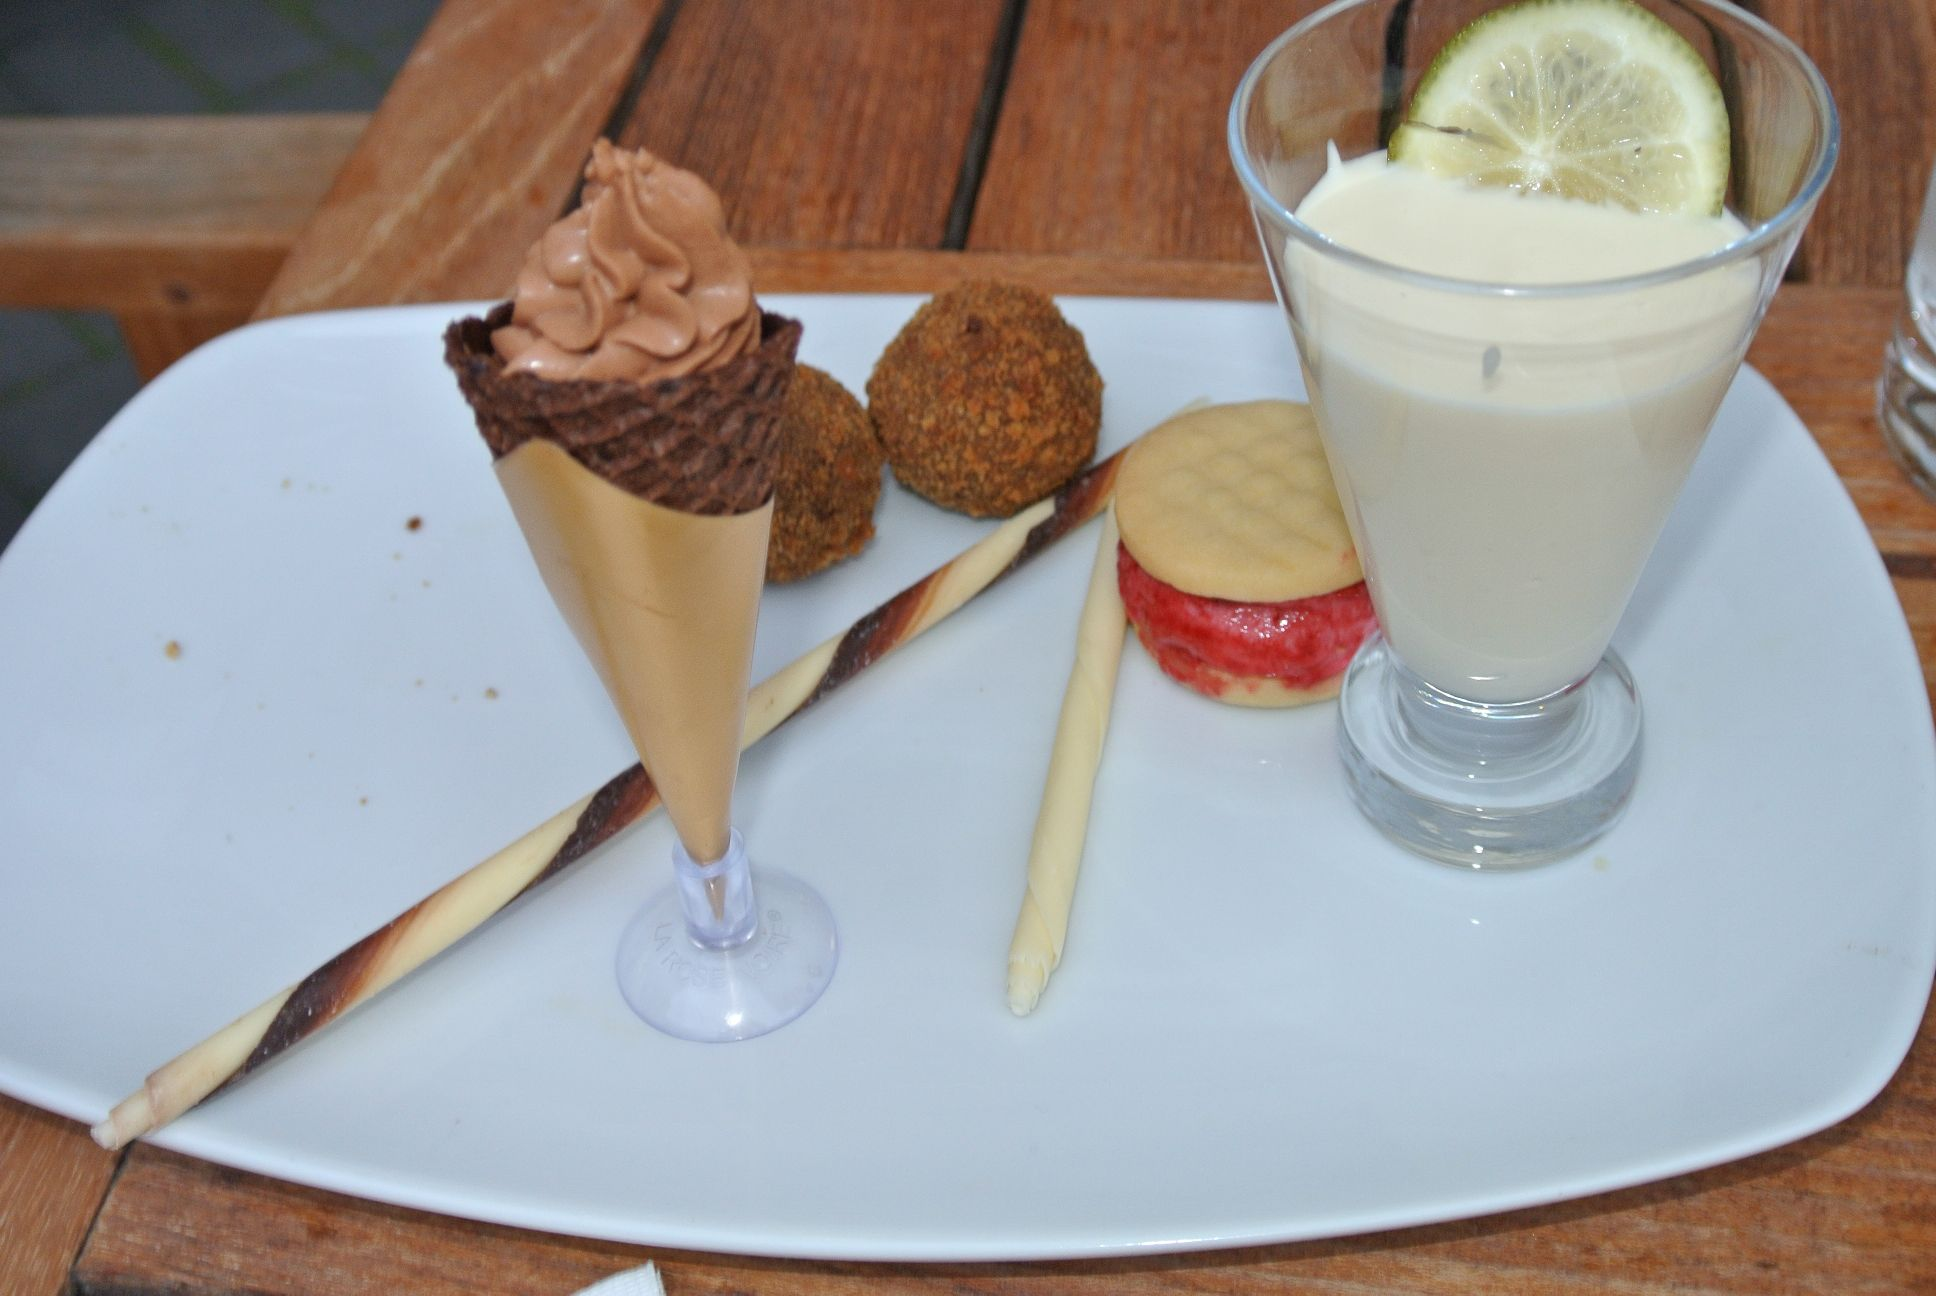 Chocolate Trio - Raspberry Cromesqui, Ginger Chocolate Mousse, White Hot Chocolate and Lime, Mini Ice Cream Sandwich